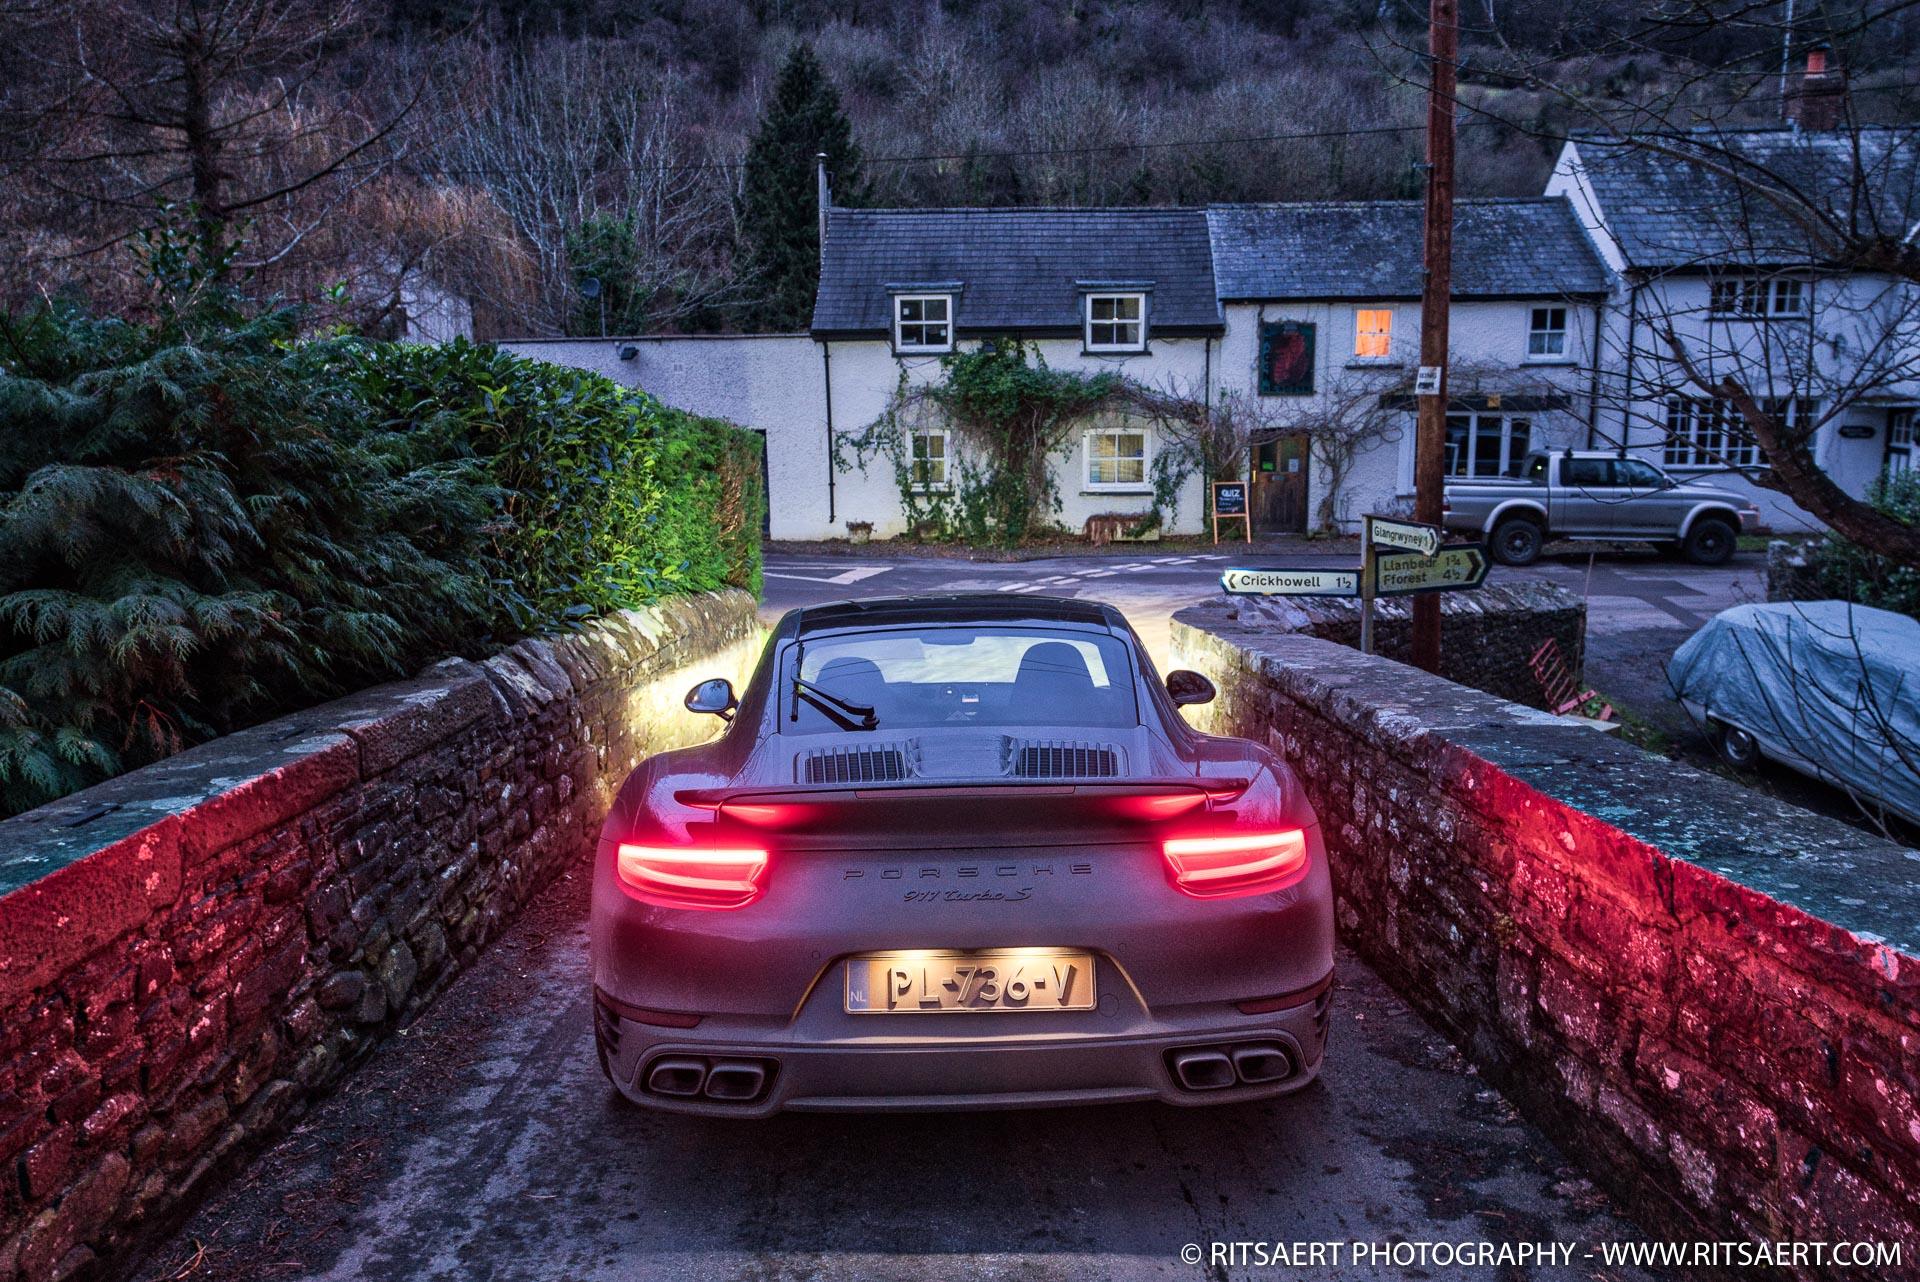 Porsche 911 Turbo S at a bridge in Brecon Beacons Wales UK